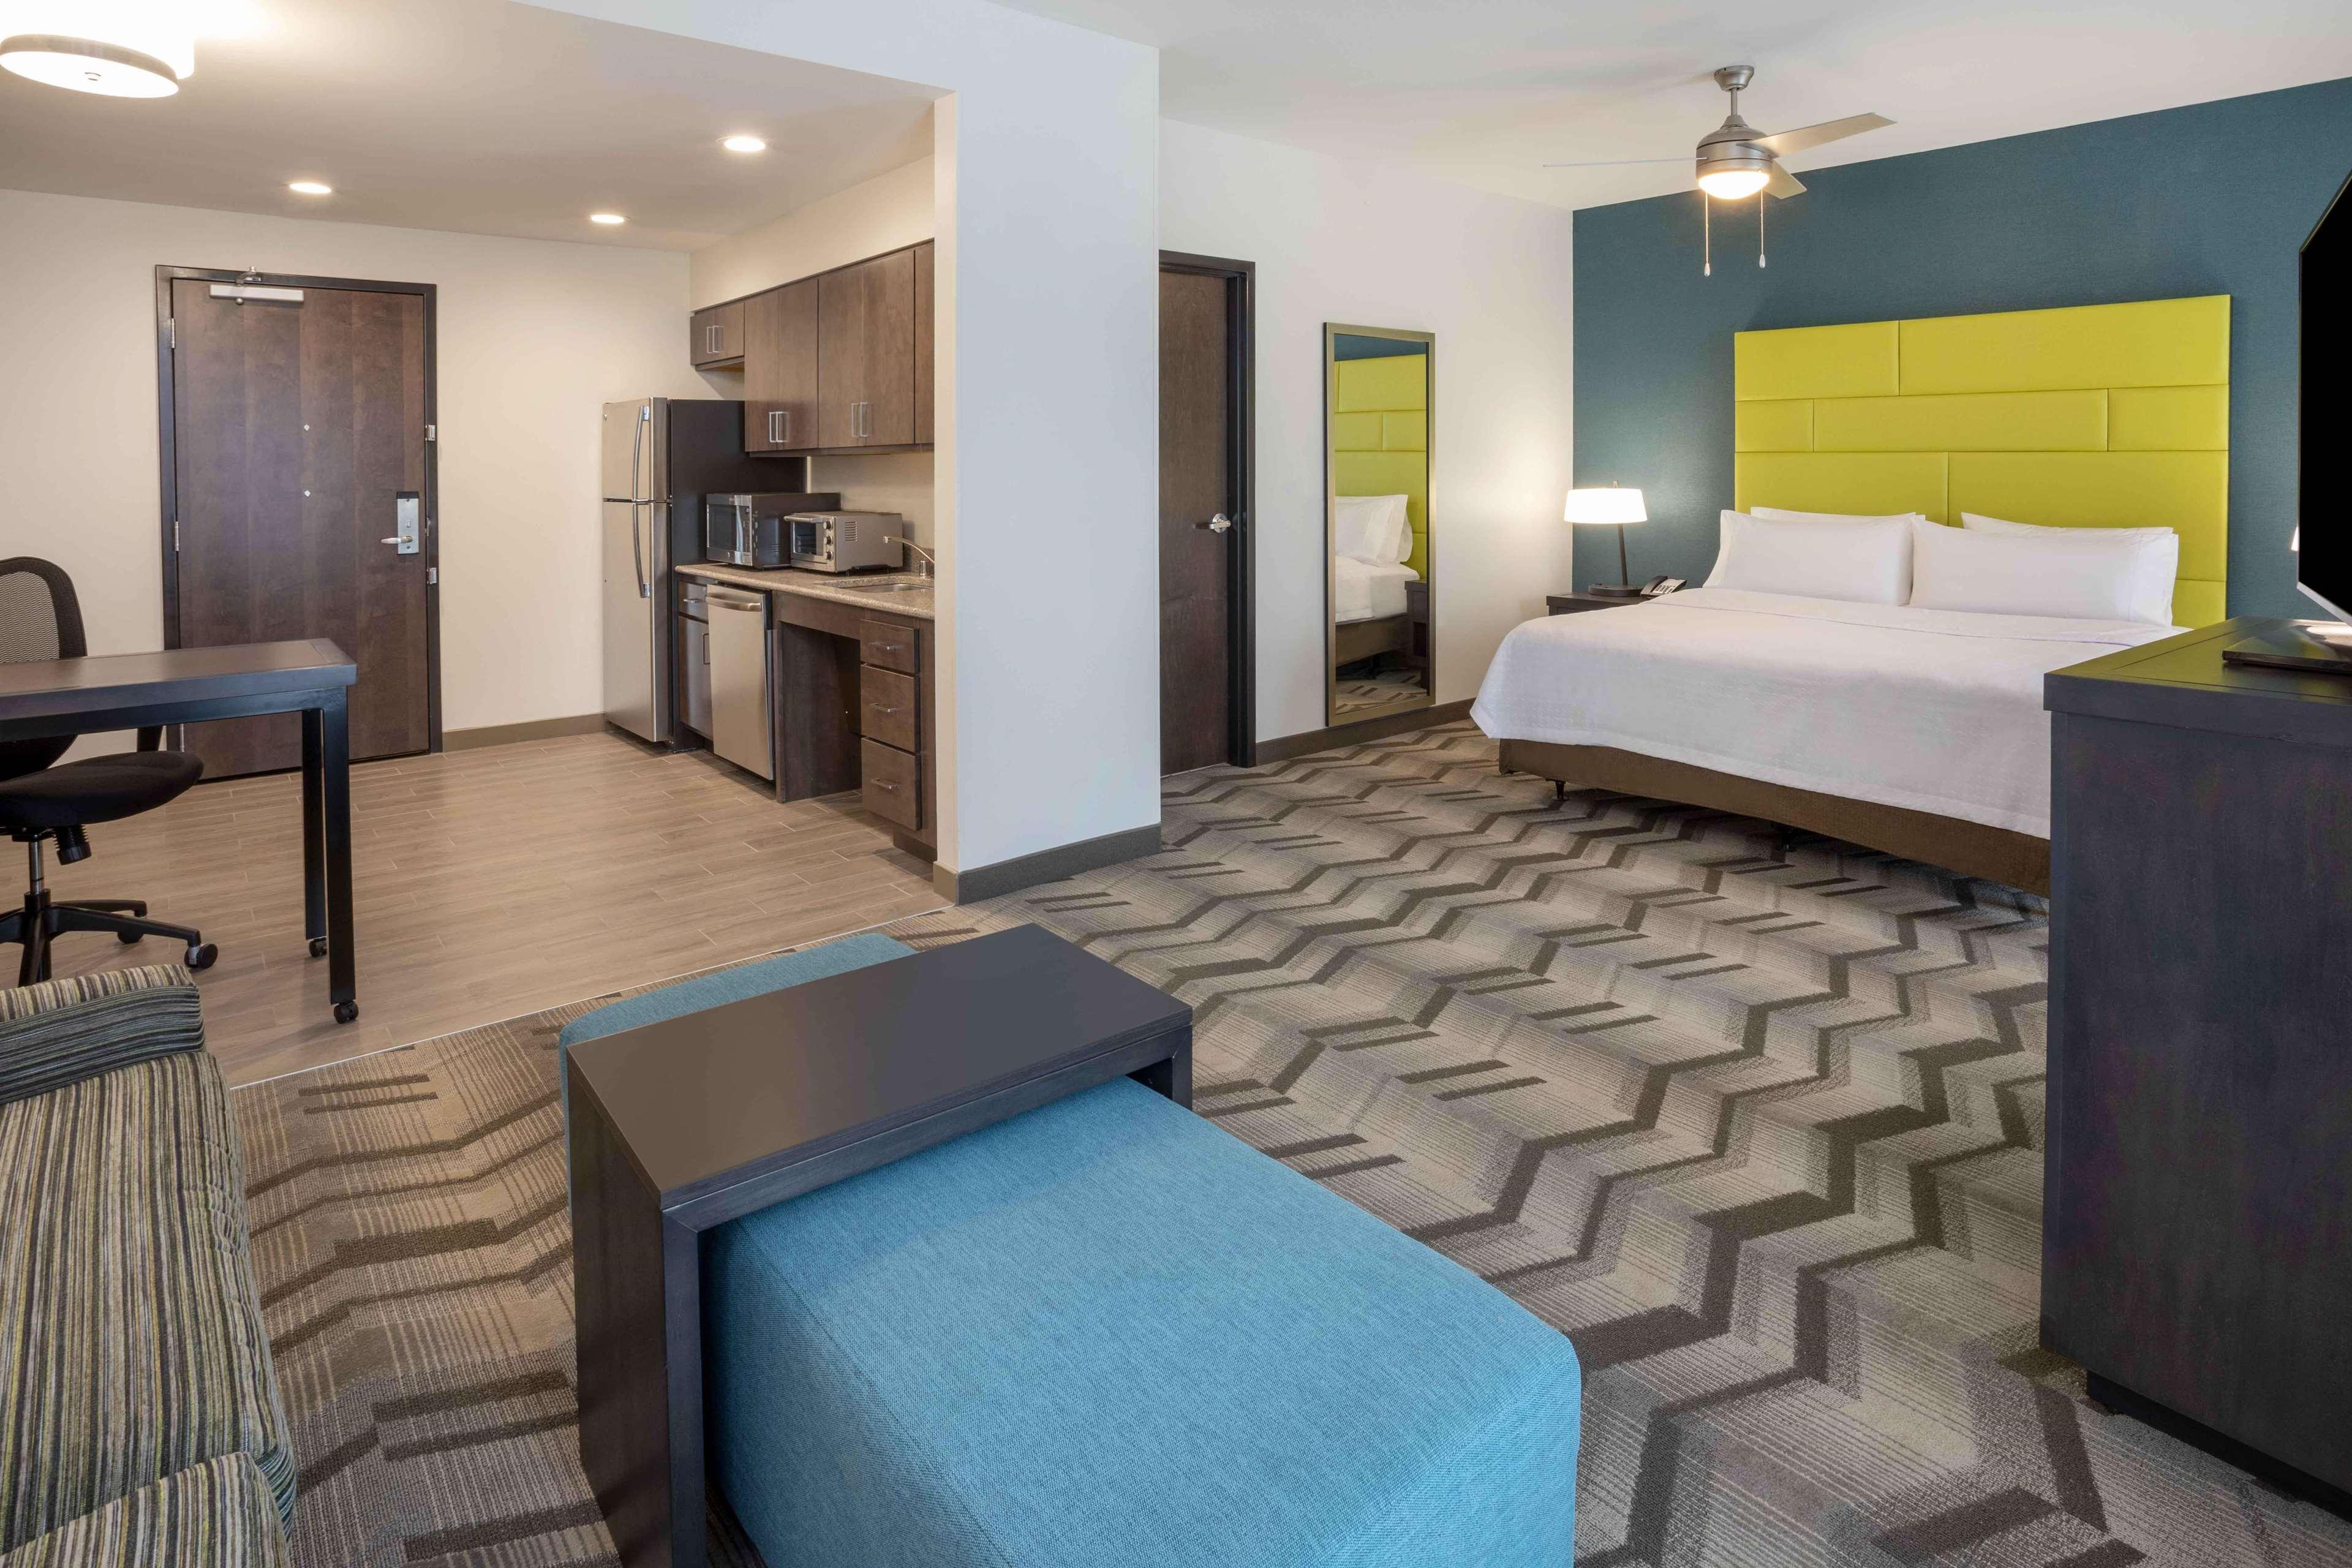 Homewood Suites by Hilton Edina Minneapolis image 28